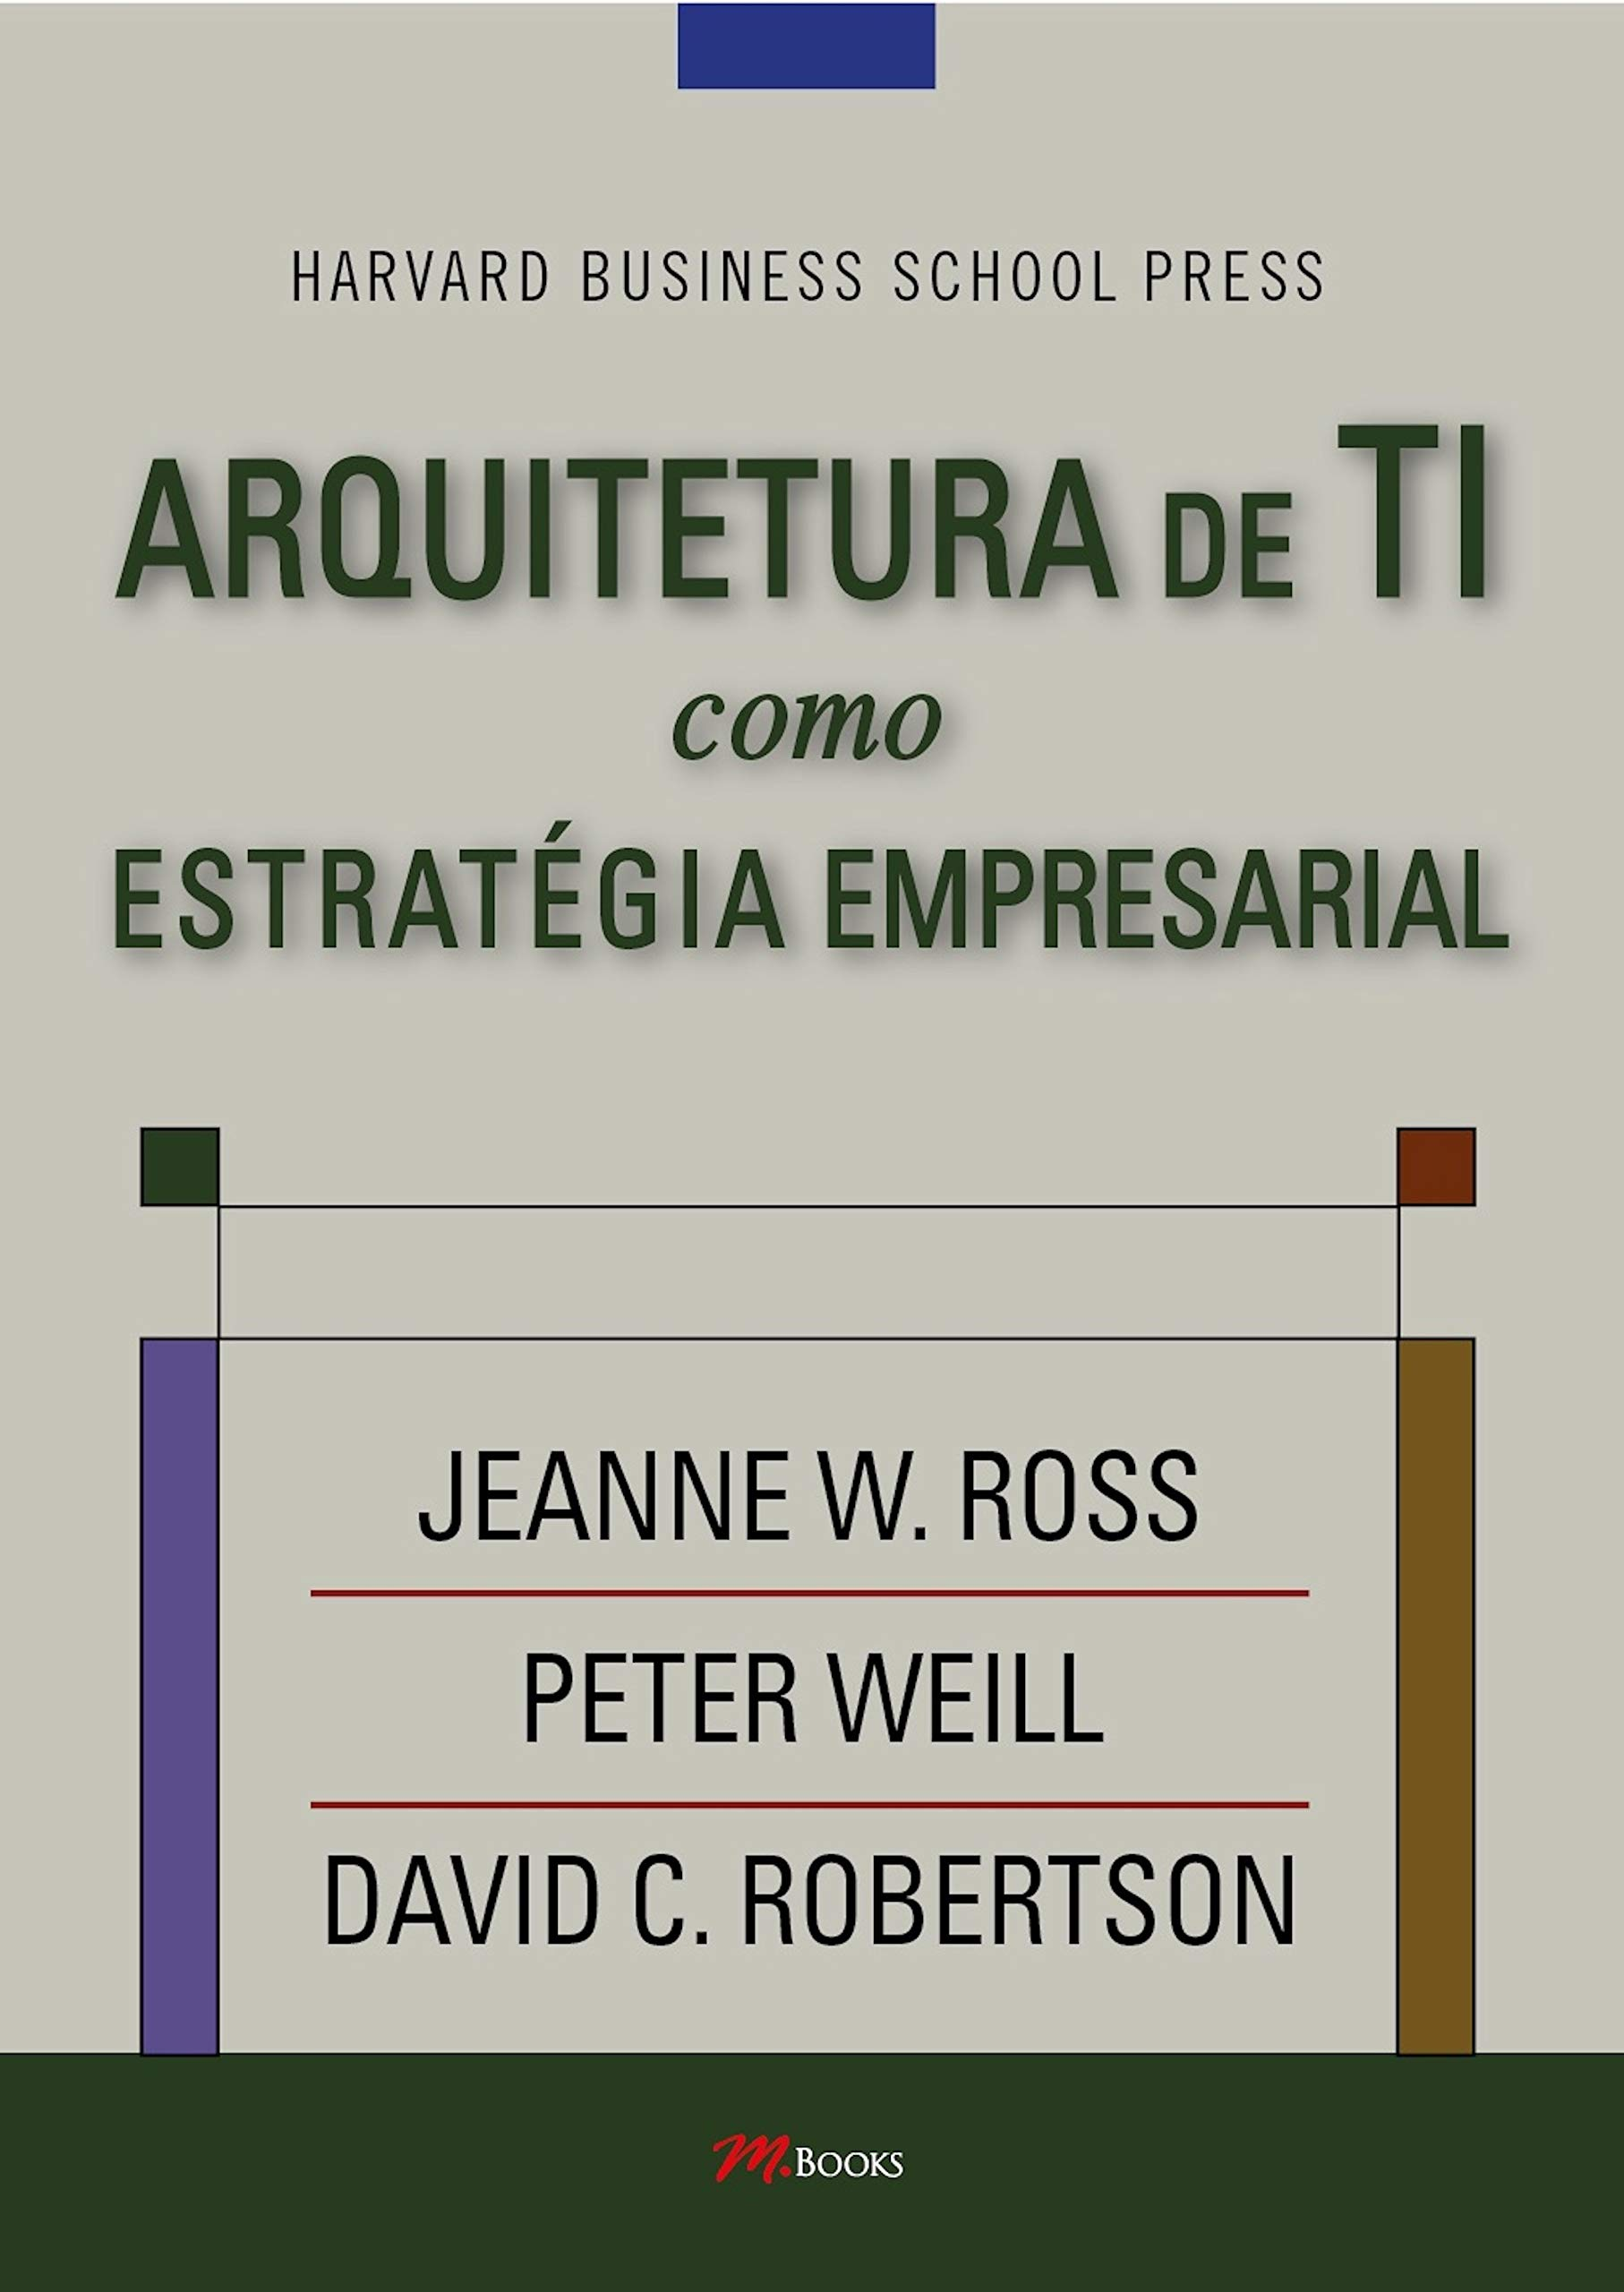 Arquitetura de TI como estratégia empresarial (Portuguese Edition)